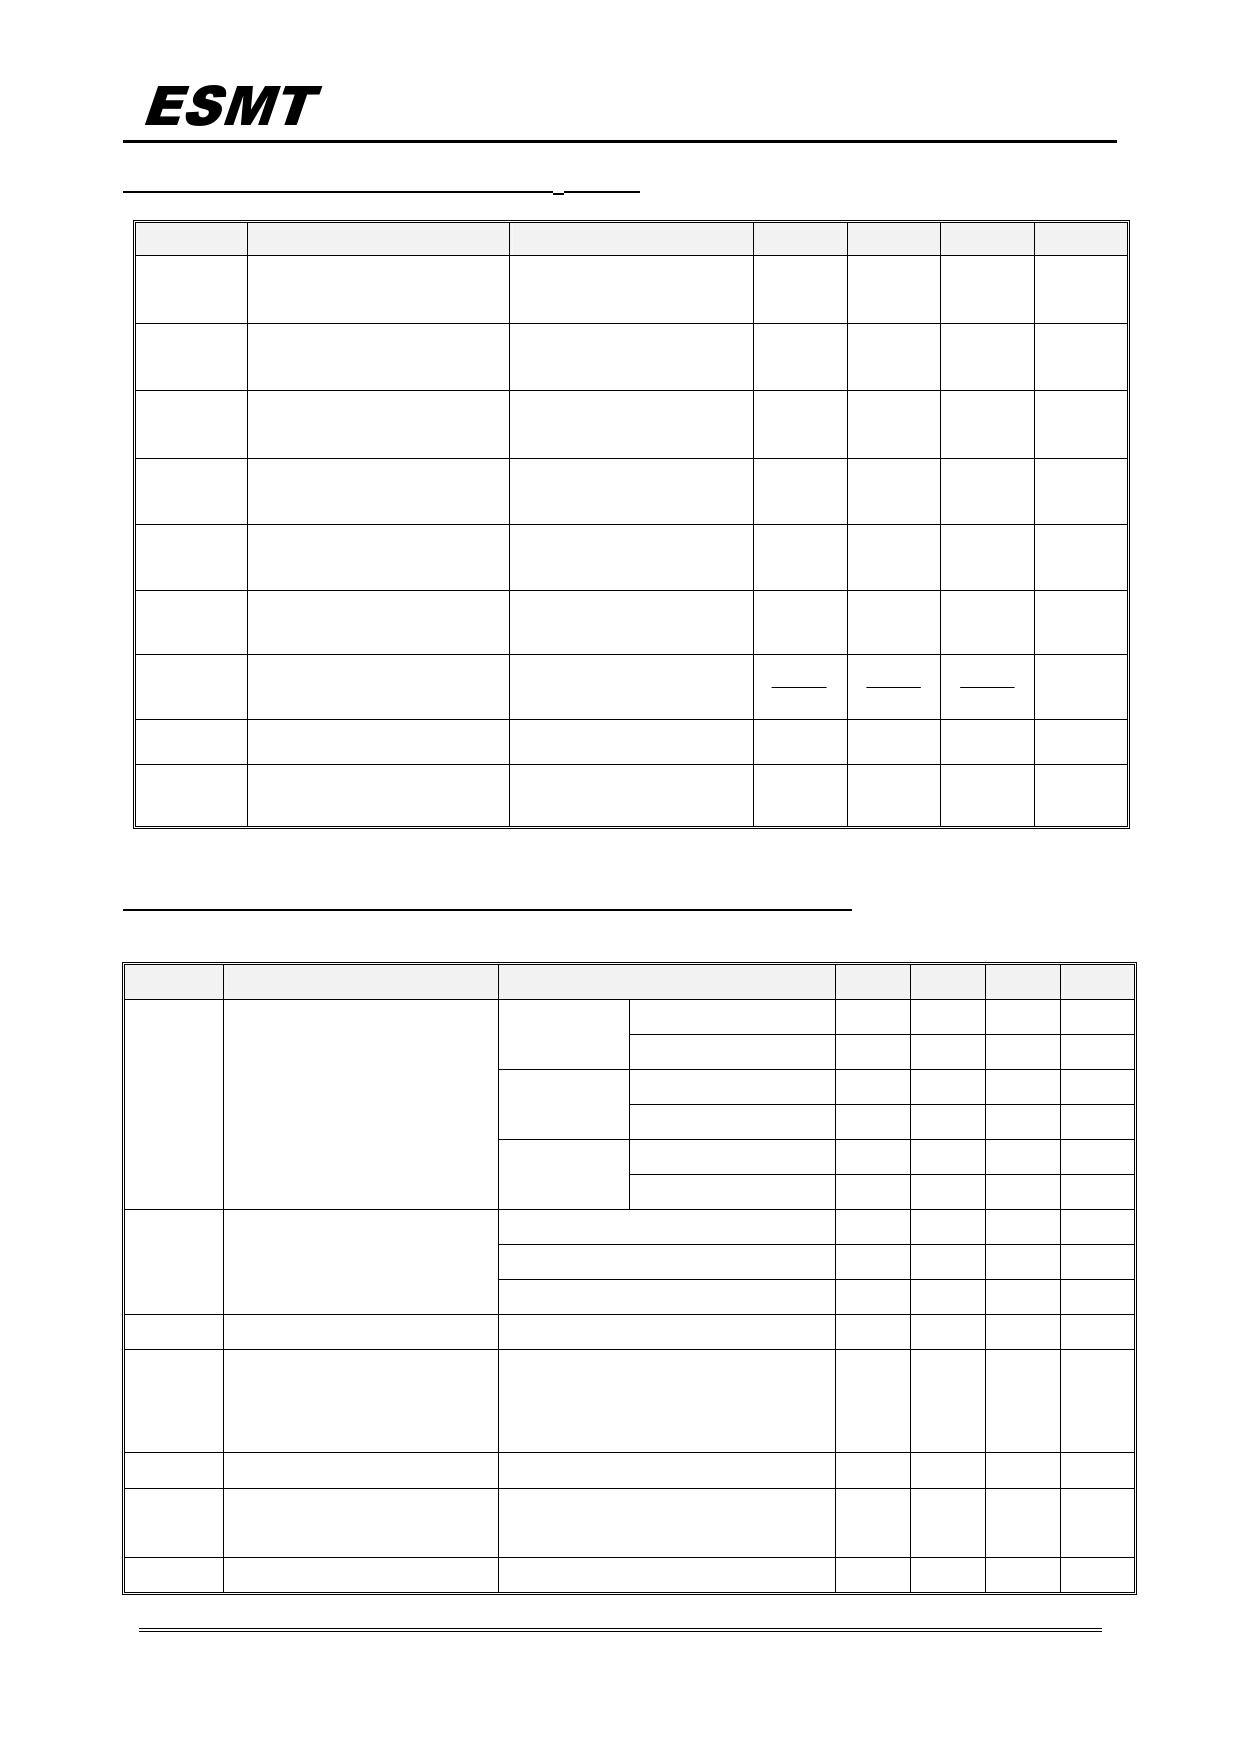 AD51652 pdf, arduino